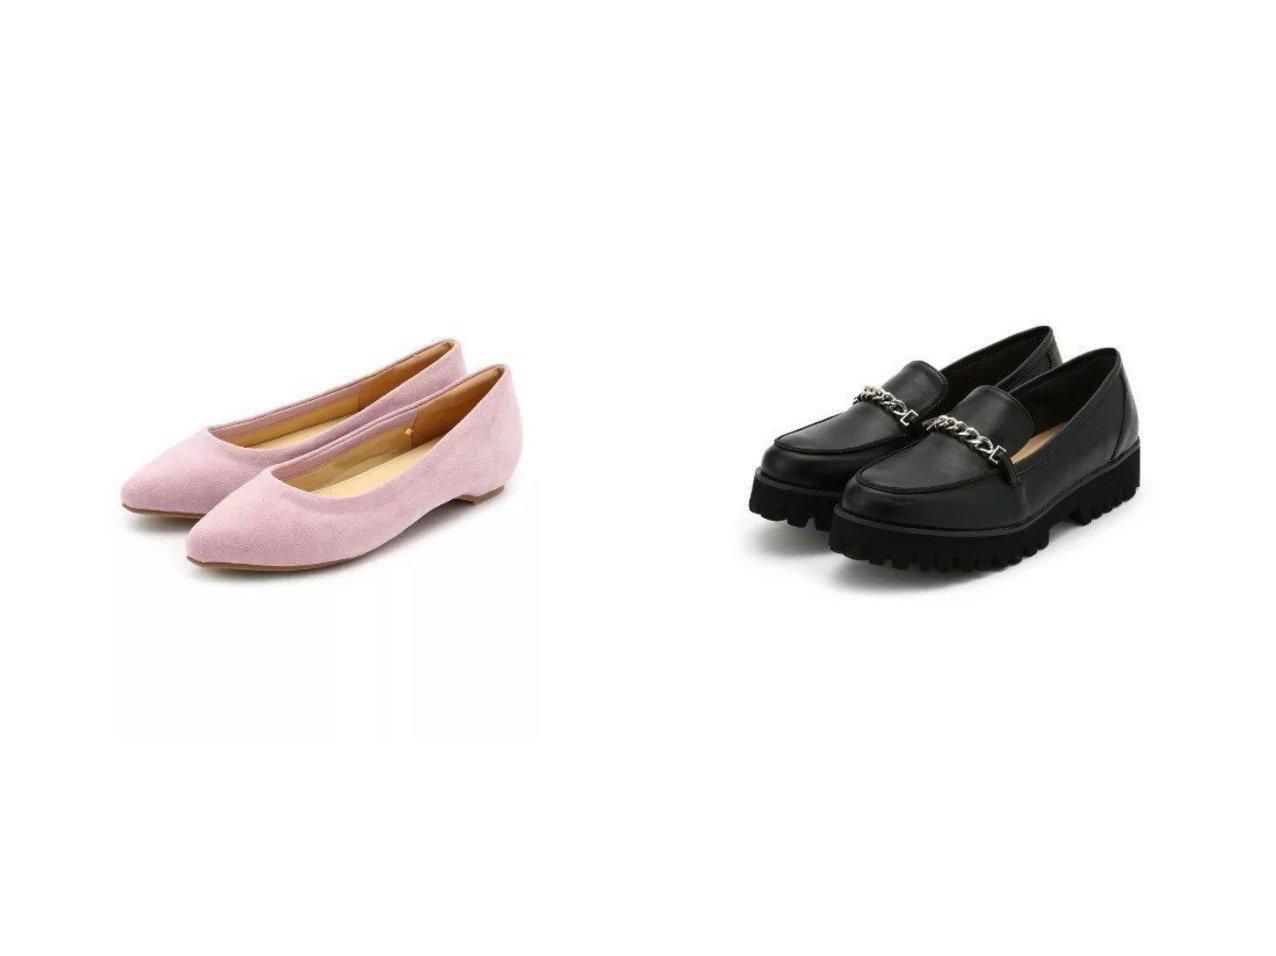 【SHOO LA RUE / DRESKIP/シューラルー ドレスキップ】の厚底チェ-ンロ-ファ-&【撥水加工】2cmインヒ-ルドレスキップス シューズ・靴のおすすめ!人気、トレンド・レディースファッションの通販 おすすめで人気の流行・トレンド、ファッションの通販商品 メンズファッション・キッズファッション・インテリア・家具・レディースファッション・服の通販 founy(ファニー) https://founy.com/ ファッション Fashion レディースファッション WOMEN クッション シューズ フィット フォーム メッシュ クール チェーン メタル 厚底 |ID:crp329100000022554